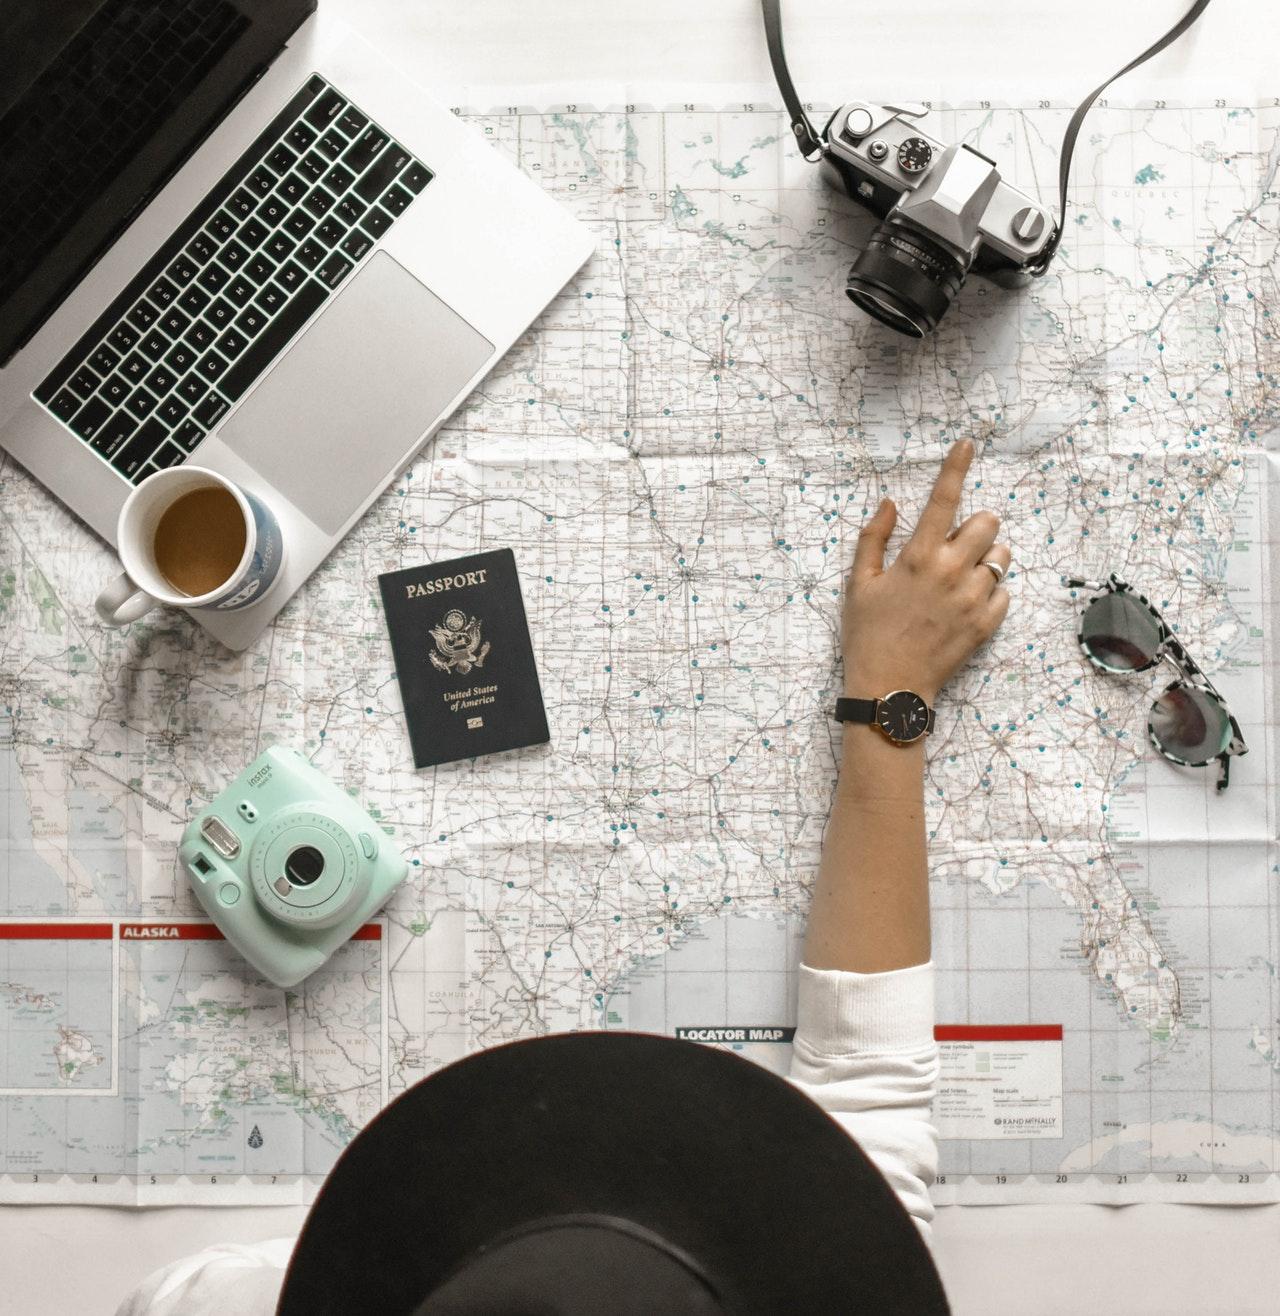 woman with gadget and passport |Taj Travel